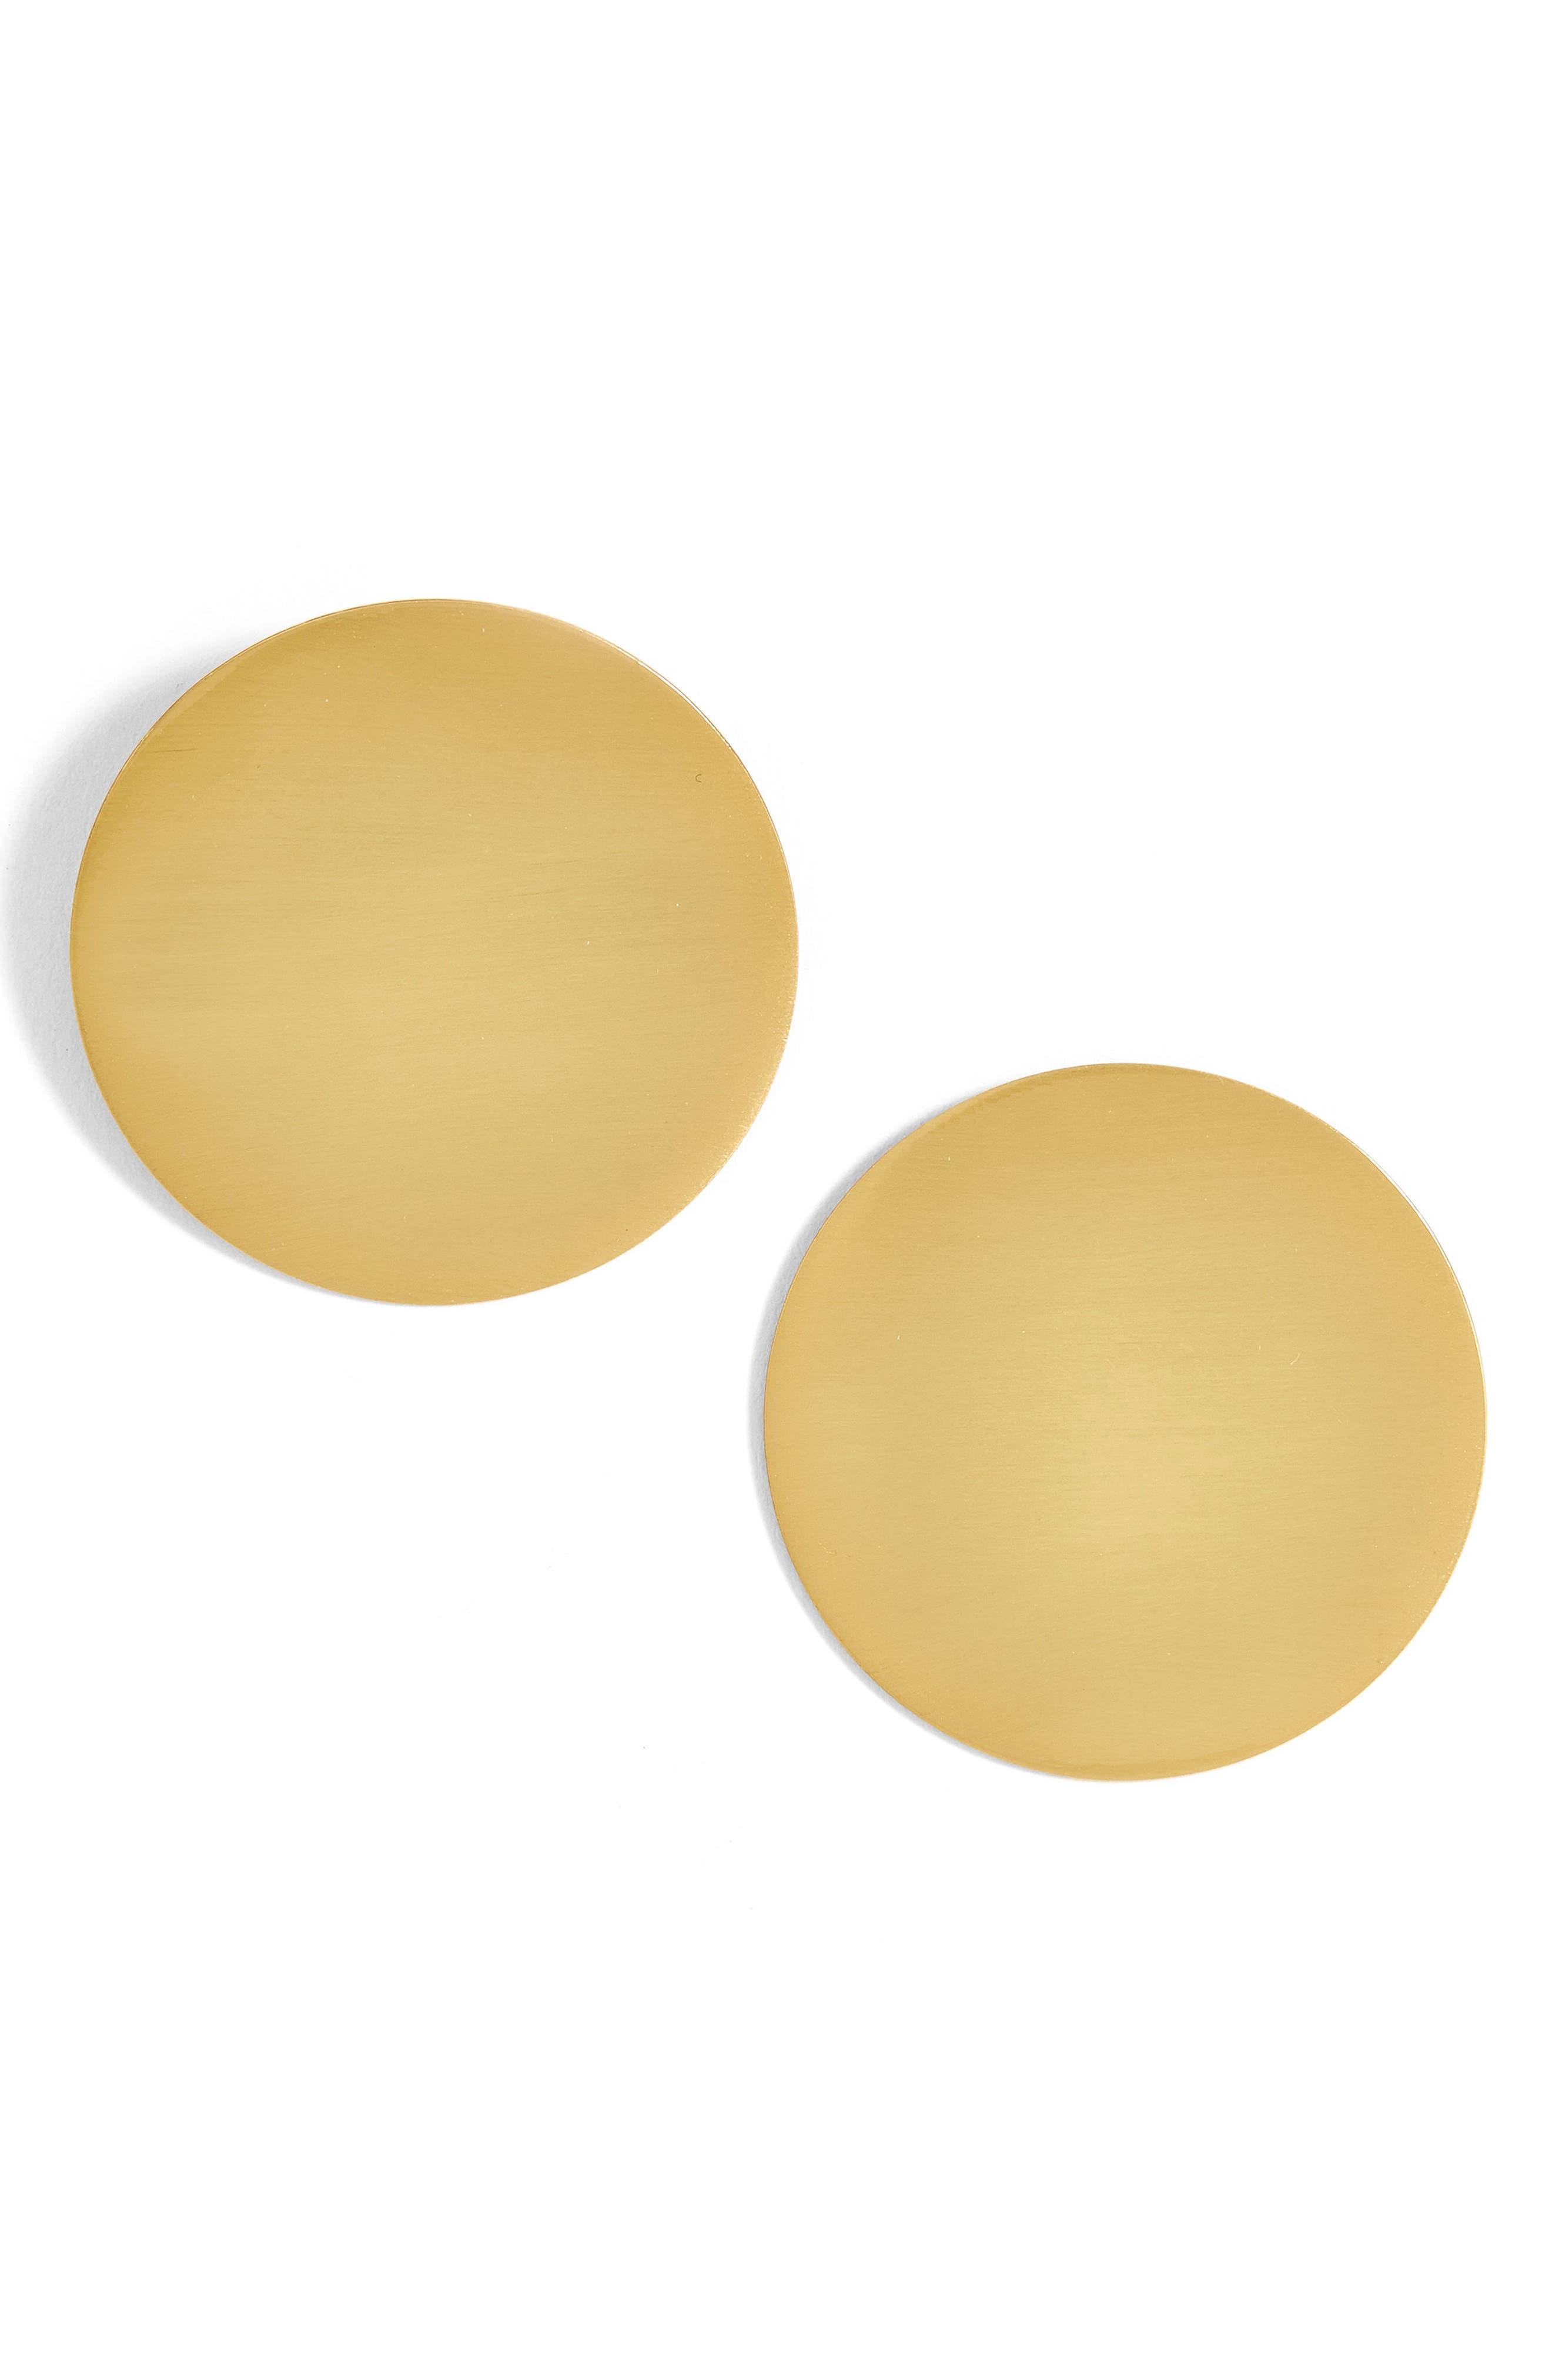 Cora Disk Stud Earrings,                         Main,                         color, 710